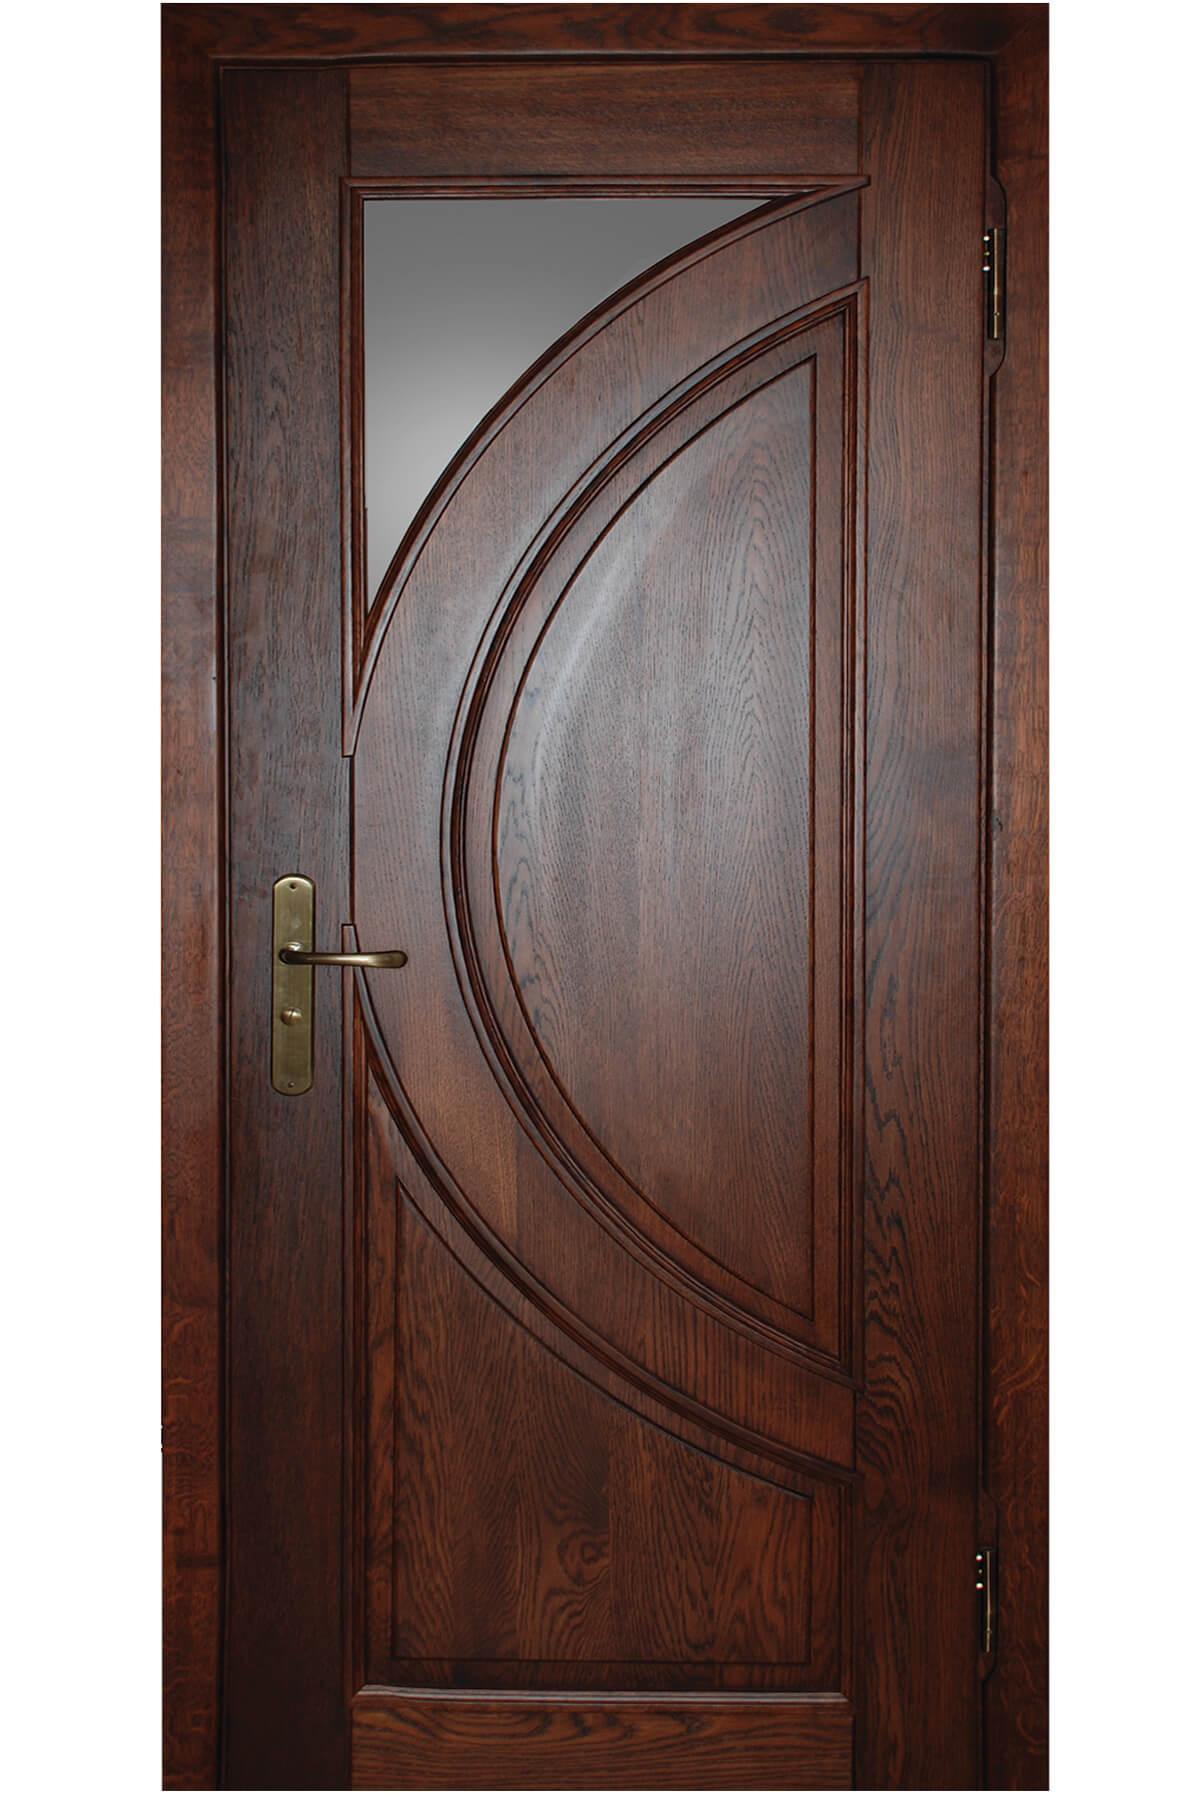 Stylish Interior Doors Stolarstwo Cieslik